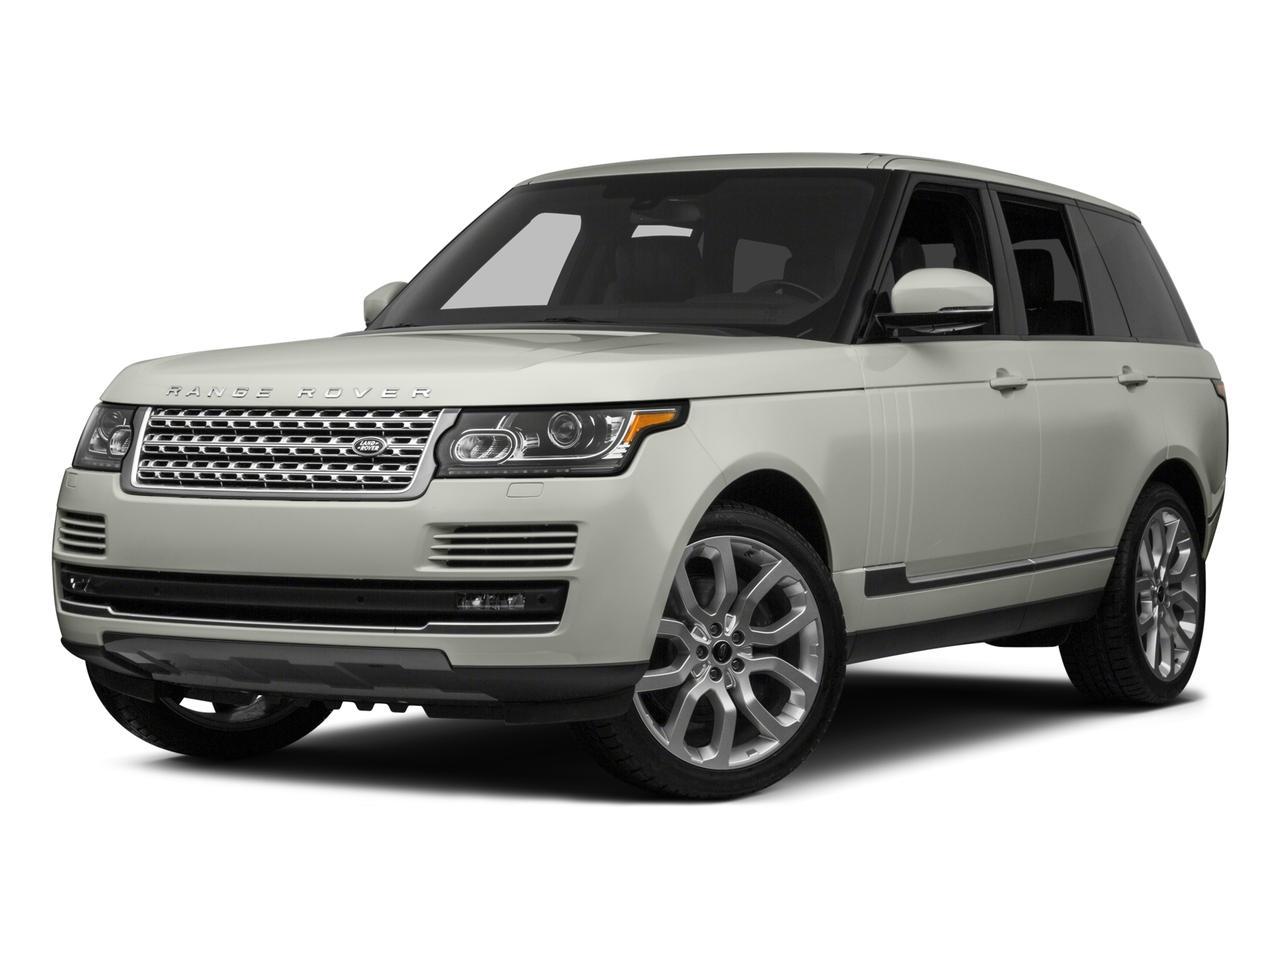 2015 Land Rover Range Rover Vehicle Photo in Austin, TX 78759